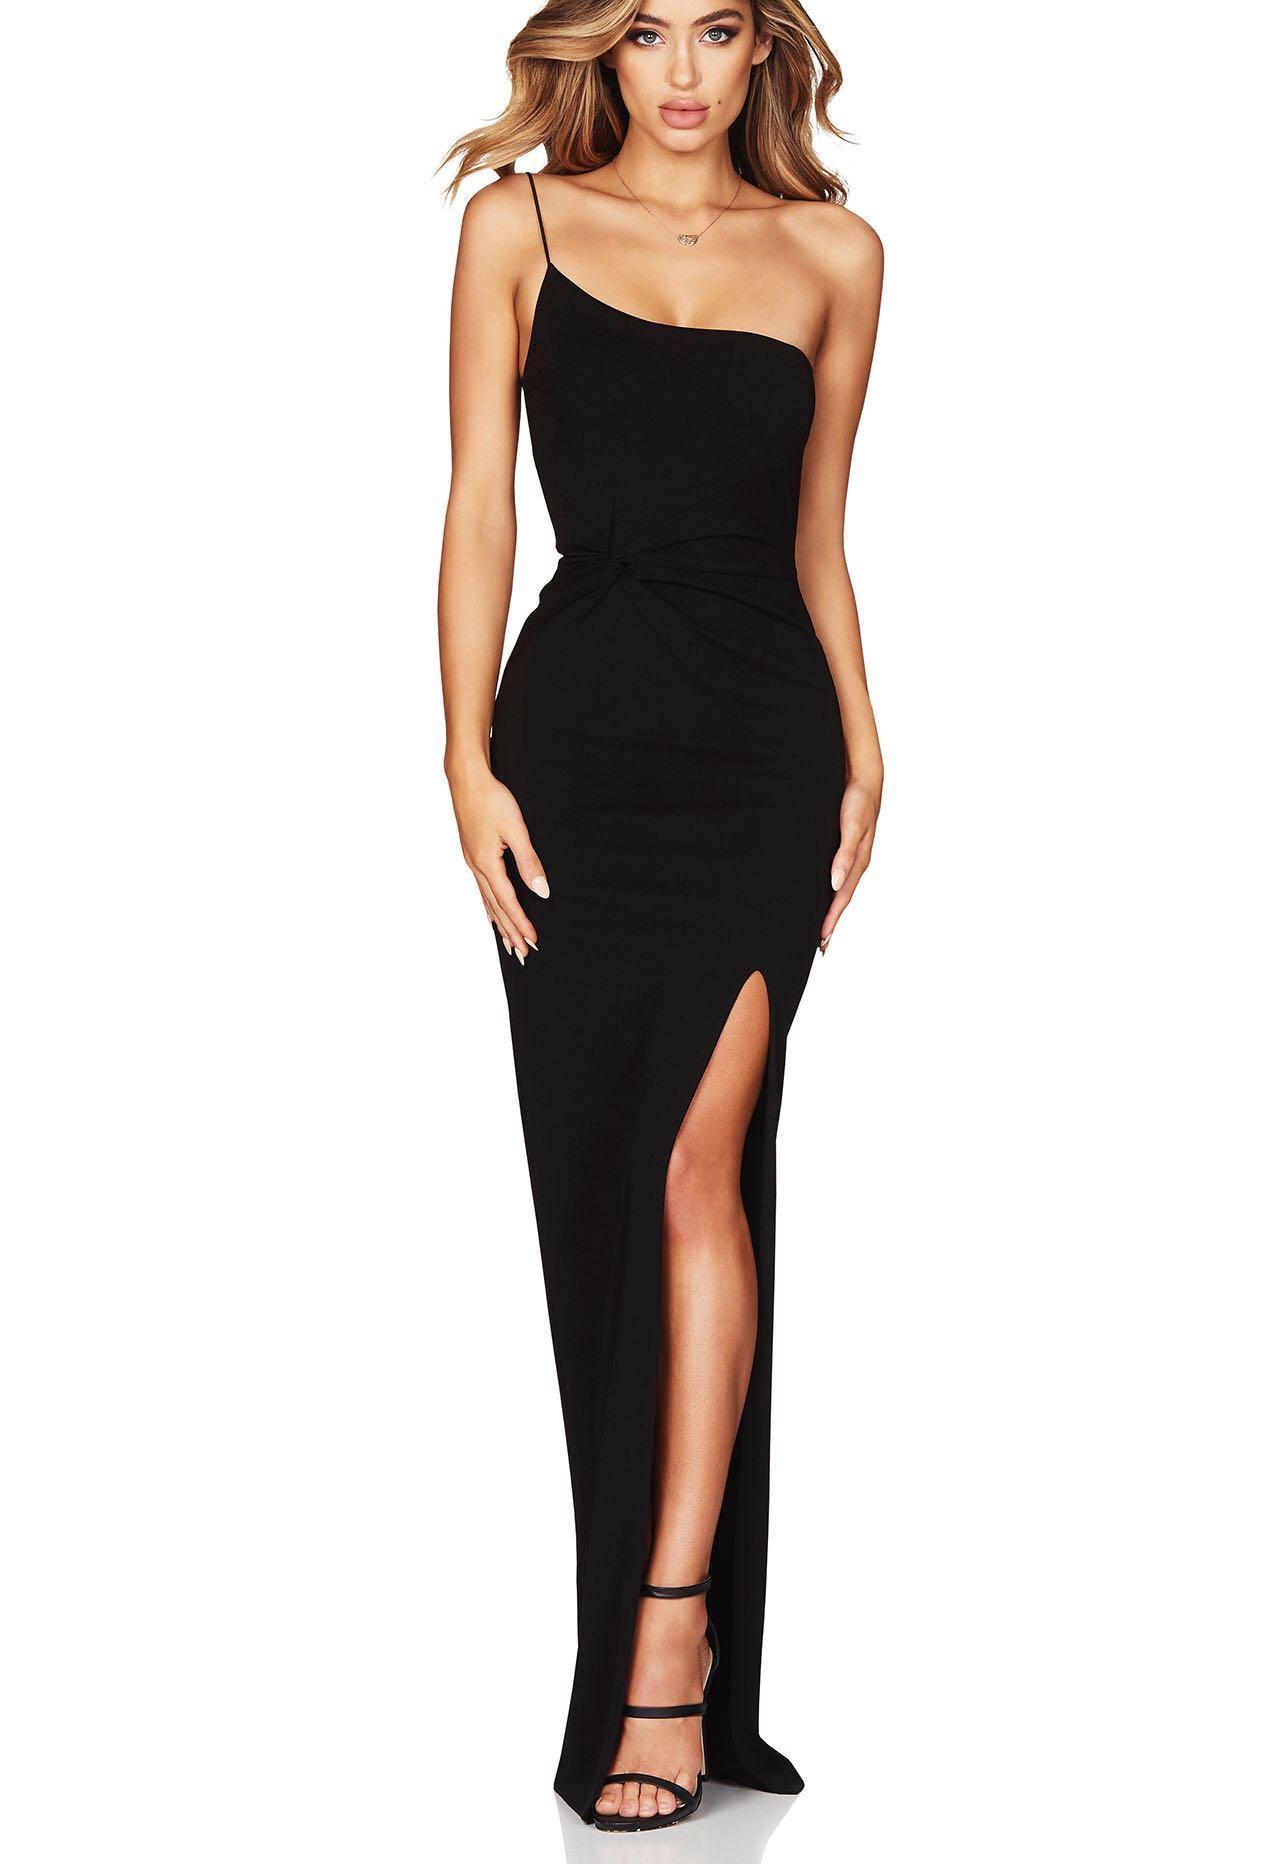 Nookie Dress - price neg